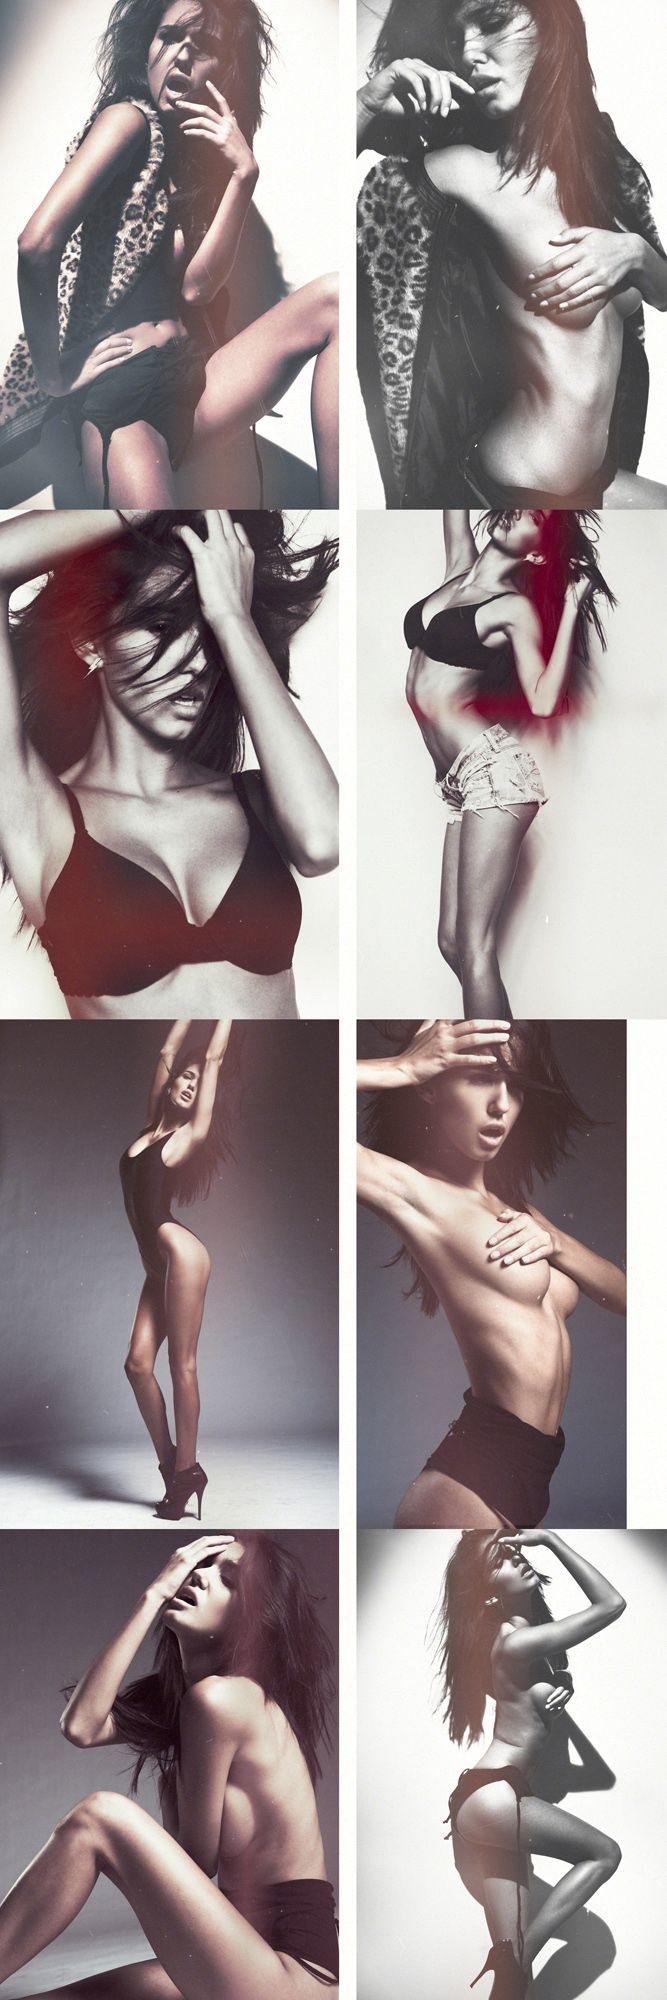 photographer: Lucima model: Ashley Sky